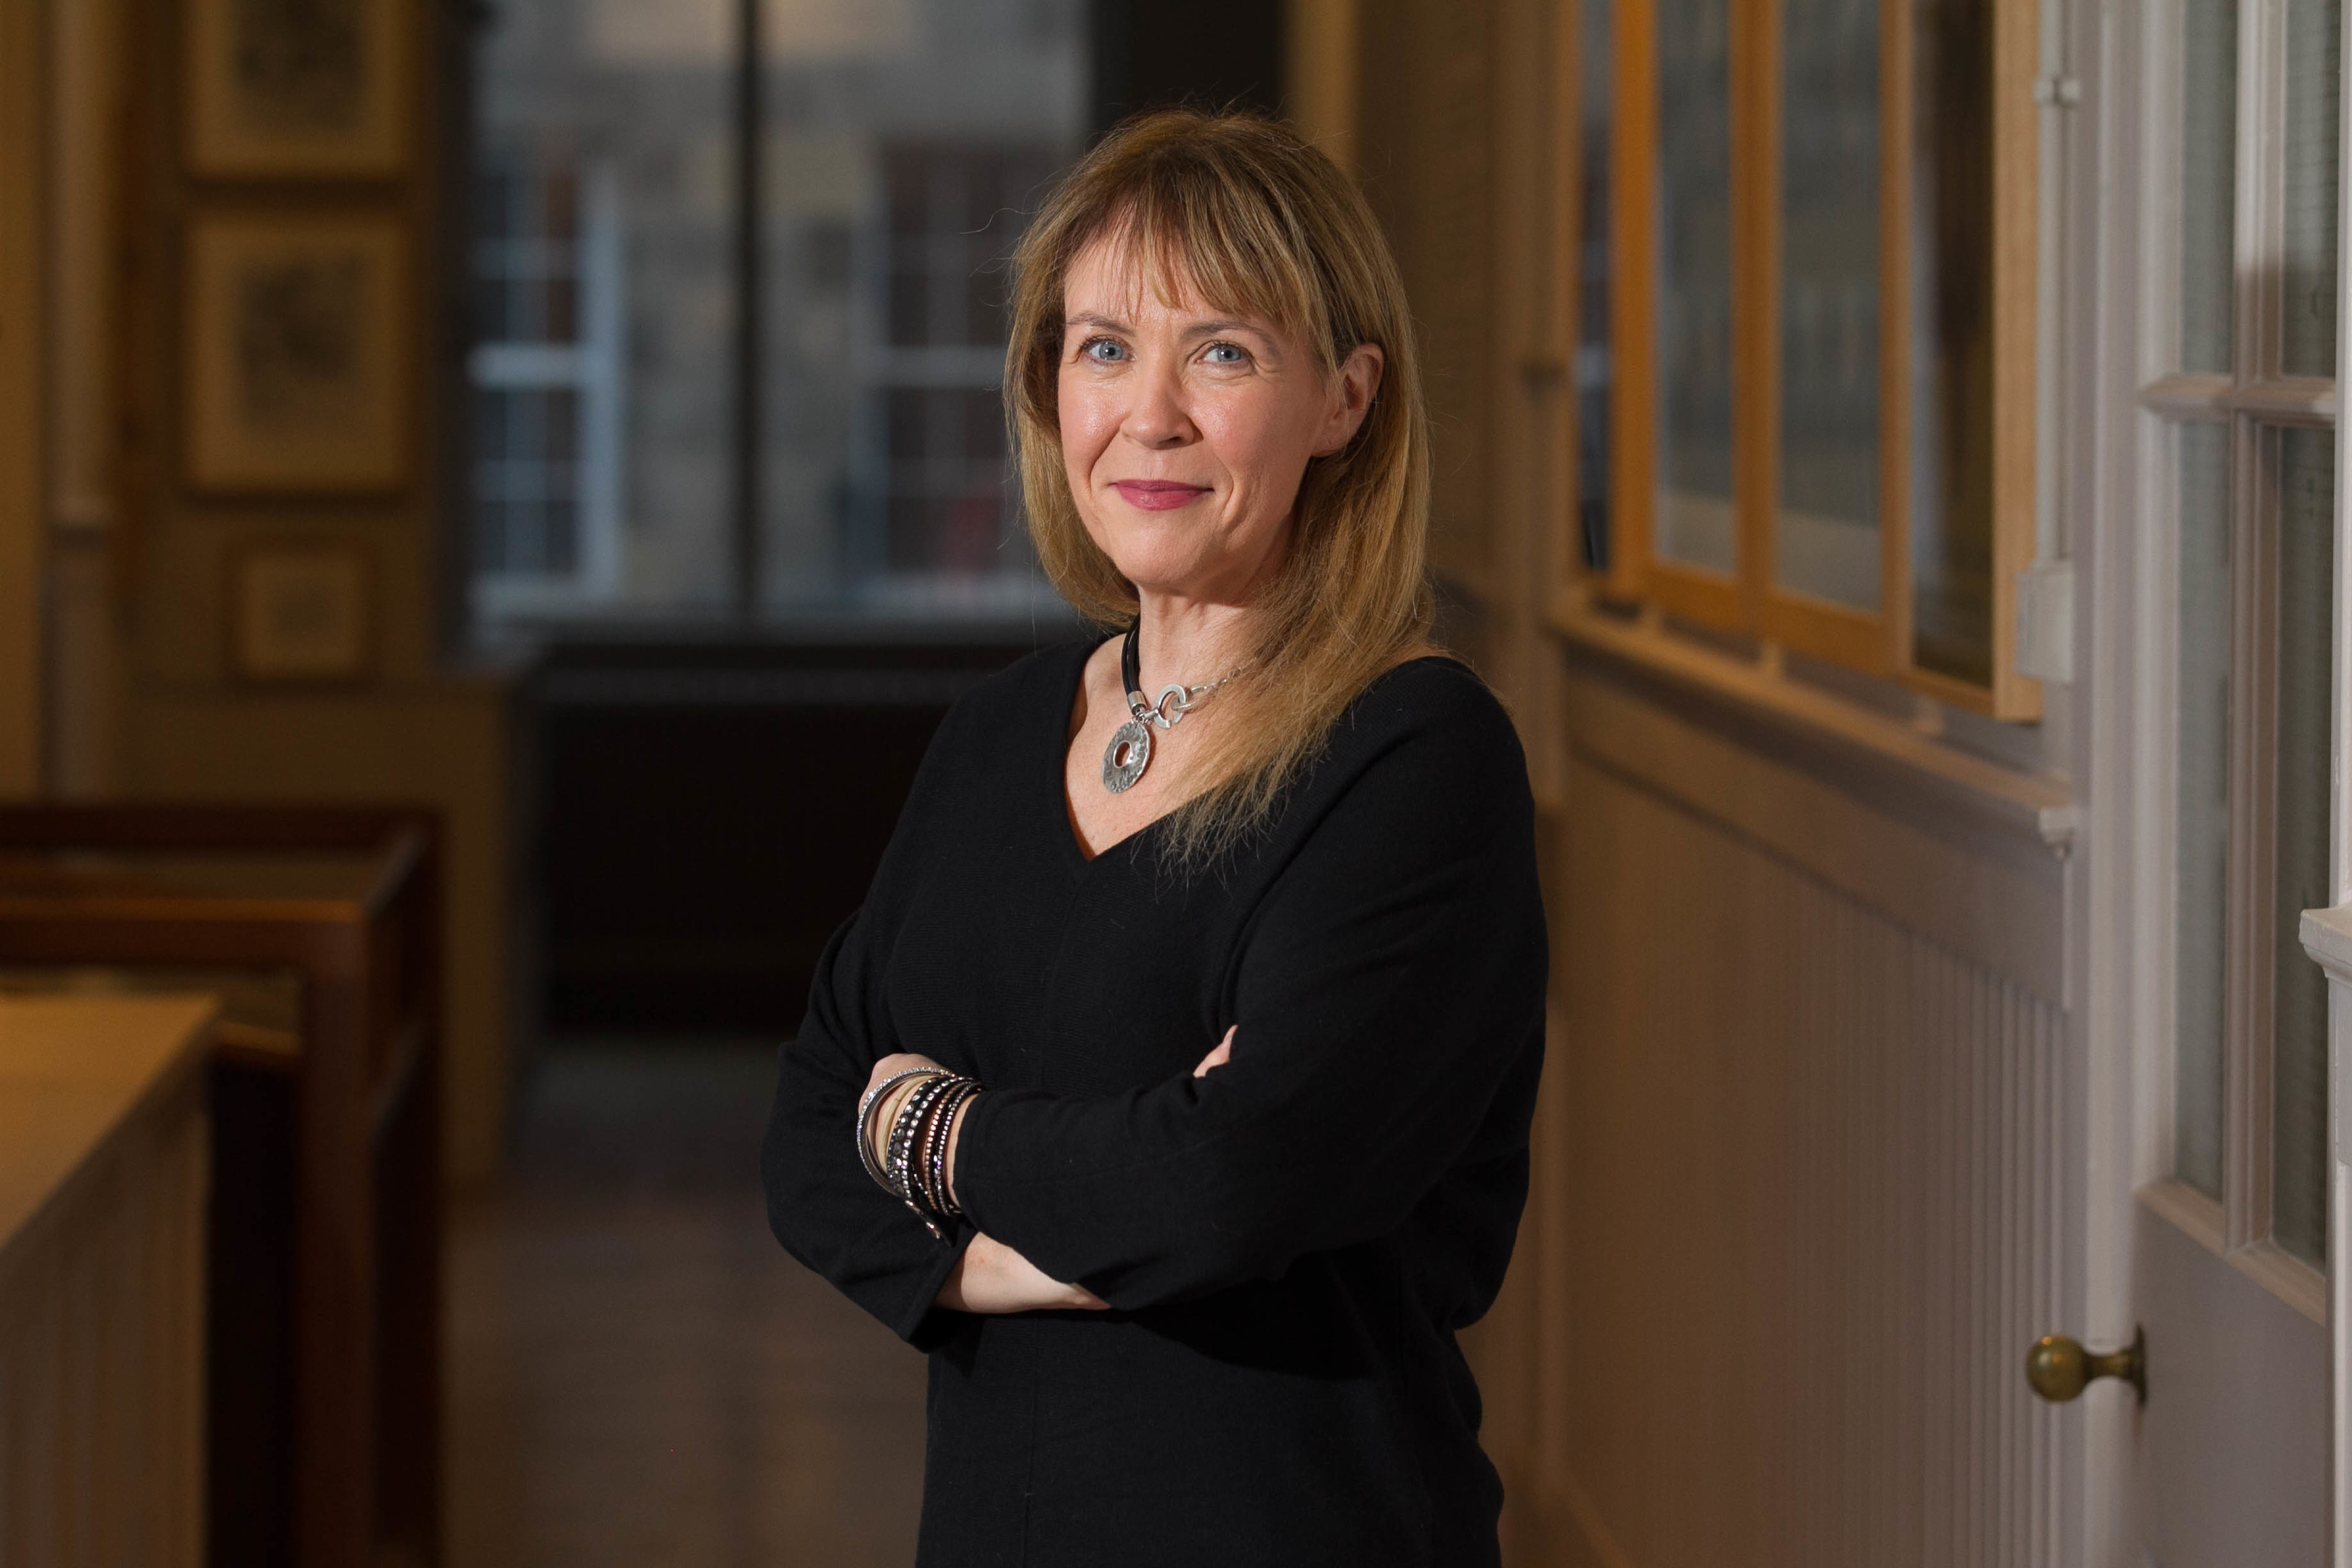 Karyn McCluskey, Head of Community Justice Scotland (Chris Austin / DC Thomson)